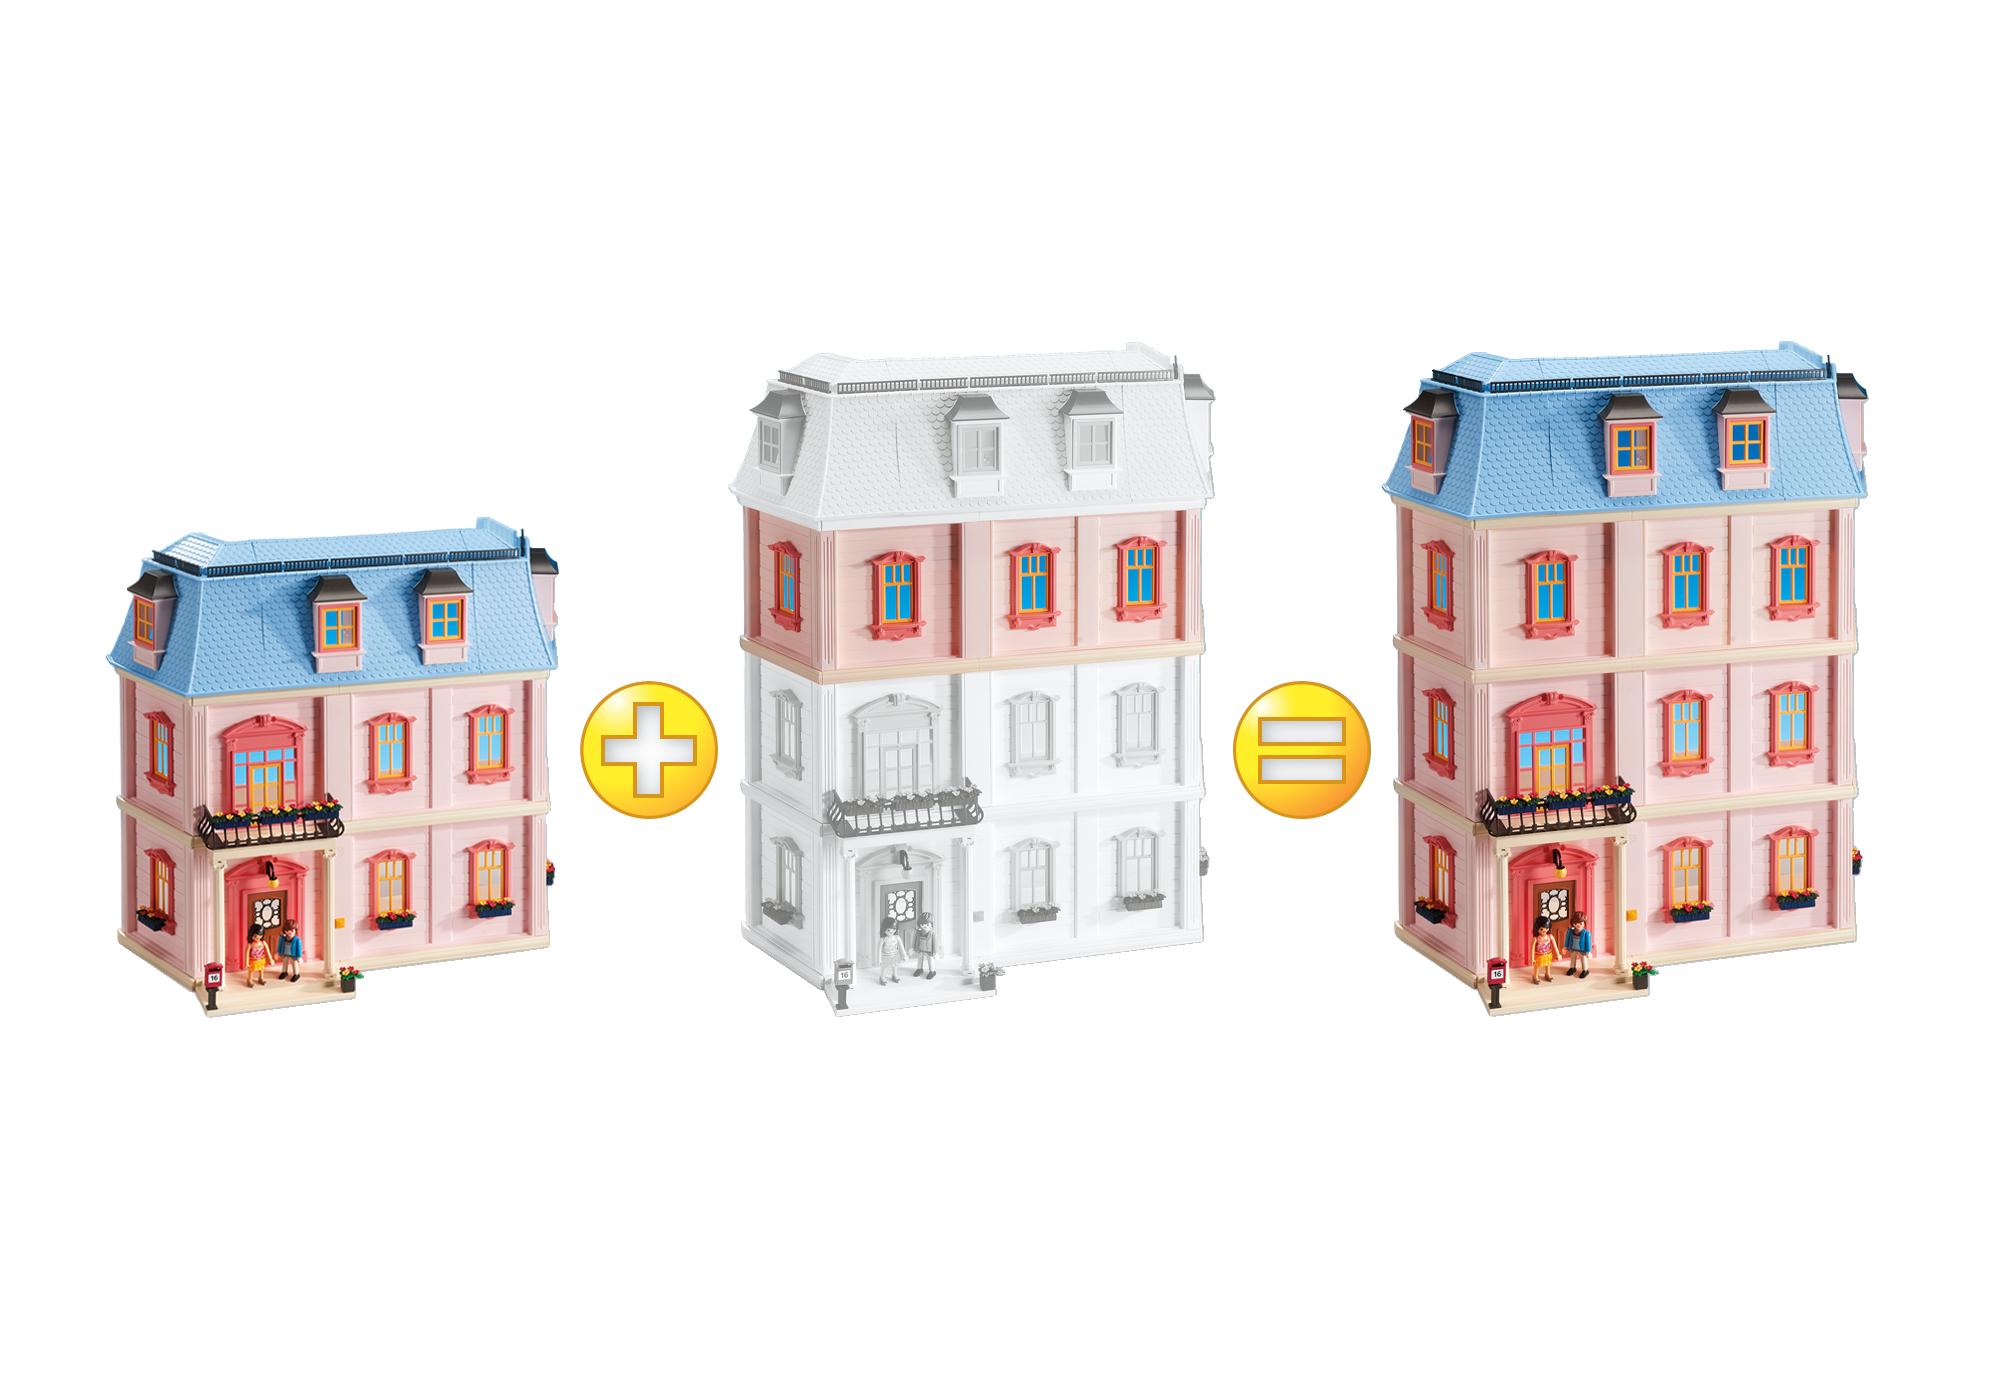 http://media.playmobil.com/i/playmobil/6453_product_extra1/Casa delle bambole estensione B